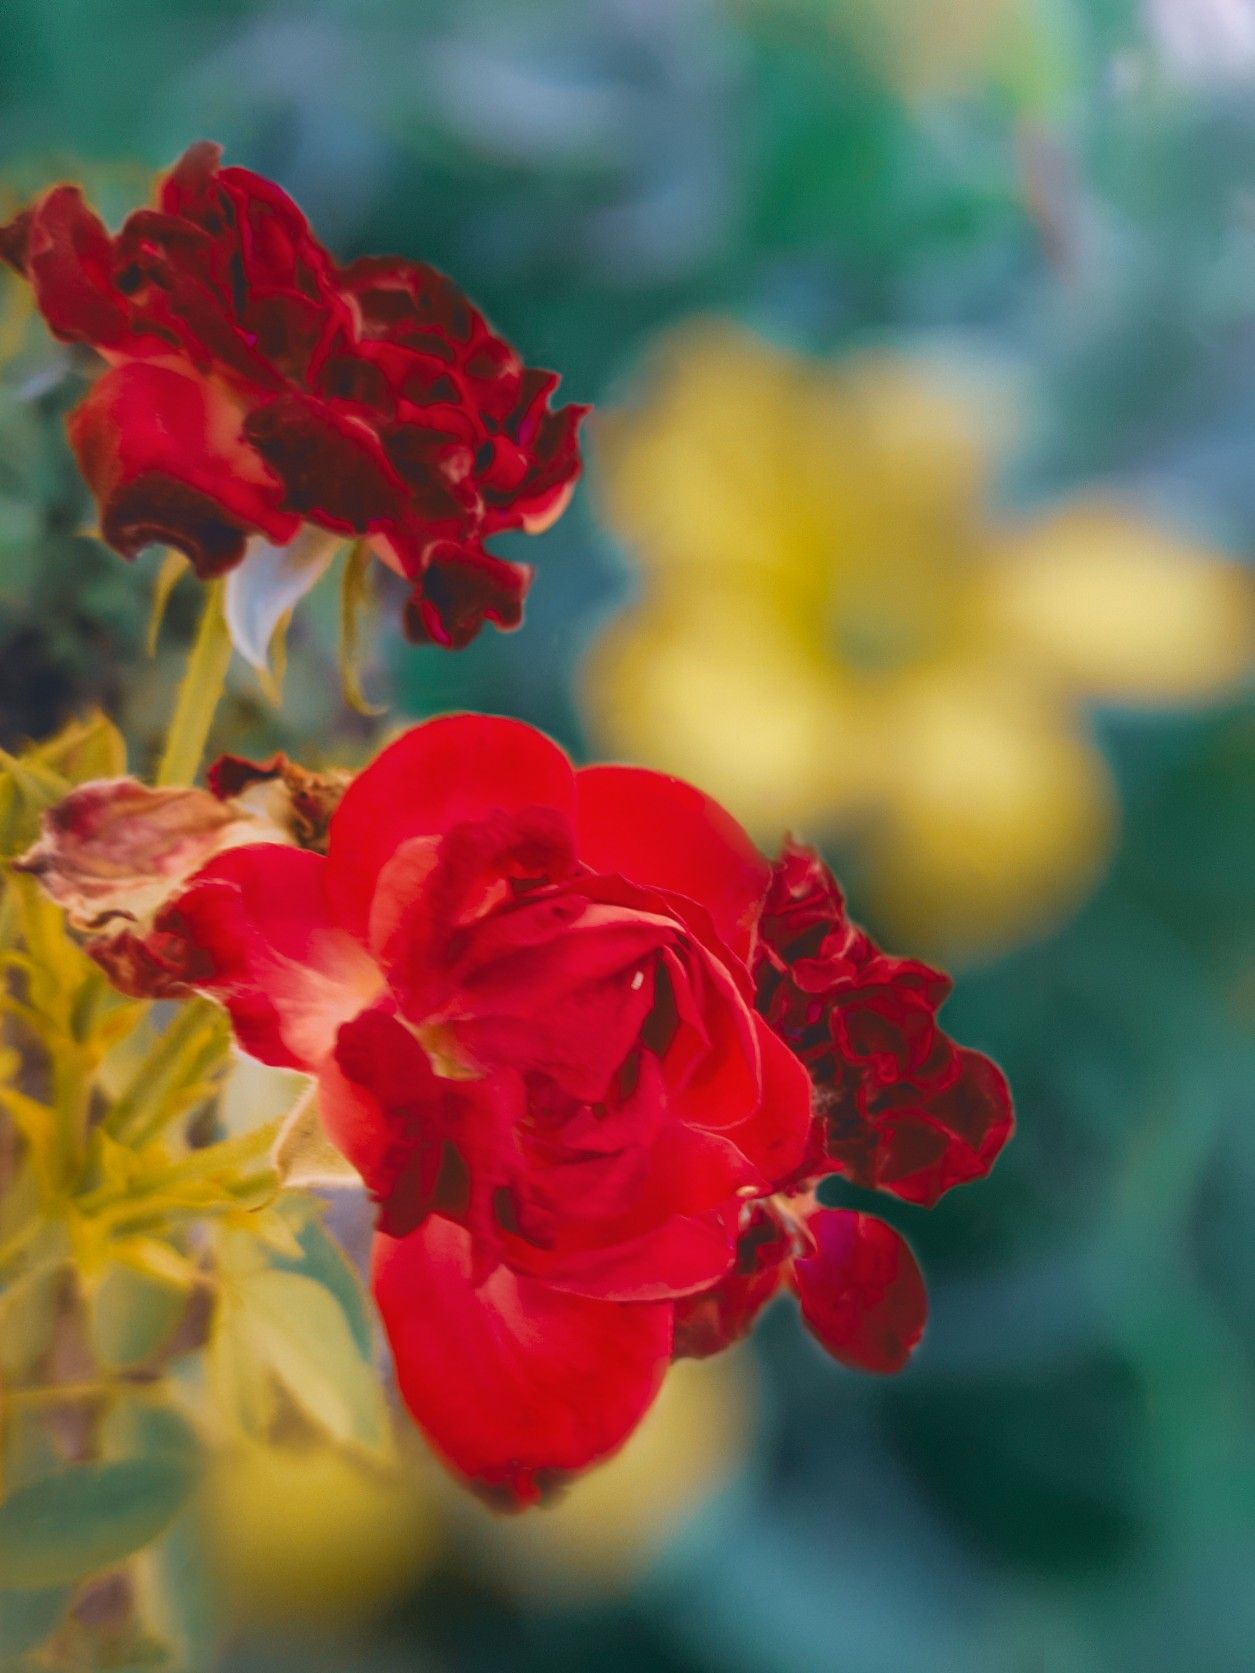 خلفيات ورد Wall Paper صور ورد ورده حمراء ورده خلفيات موبايل ورد صور بالهاتف خلفيات للموبايل Cute Couple Wallpaper Couple Wallpaper Love Rose